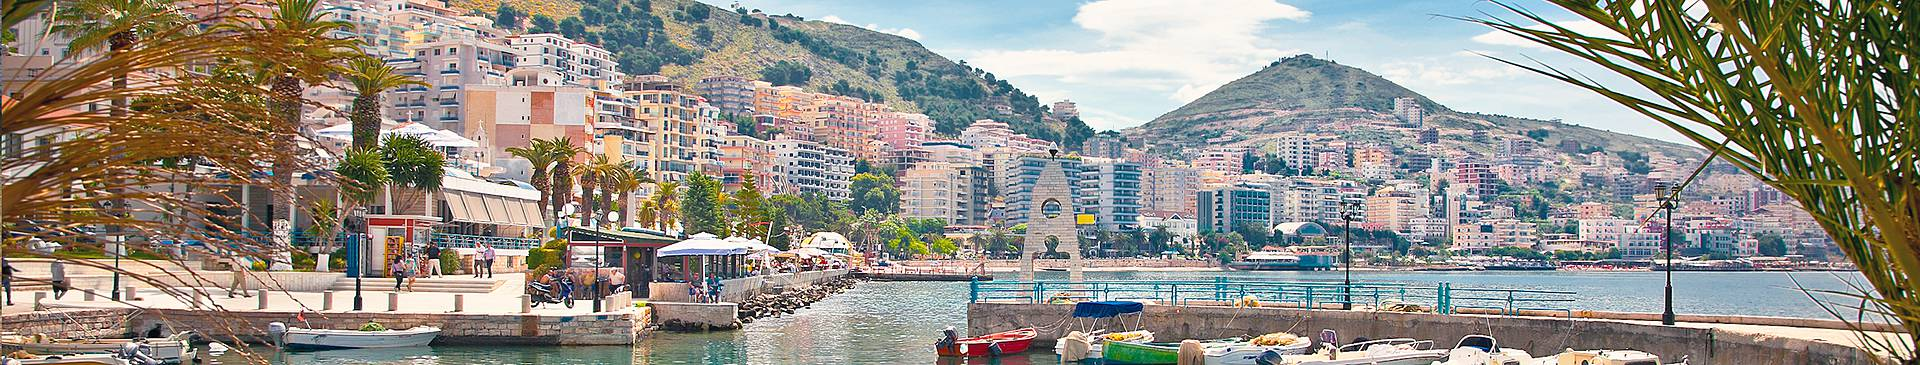 One week in Albania